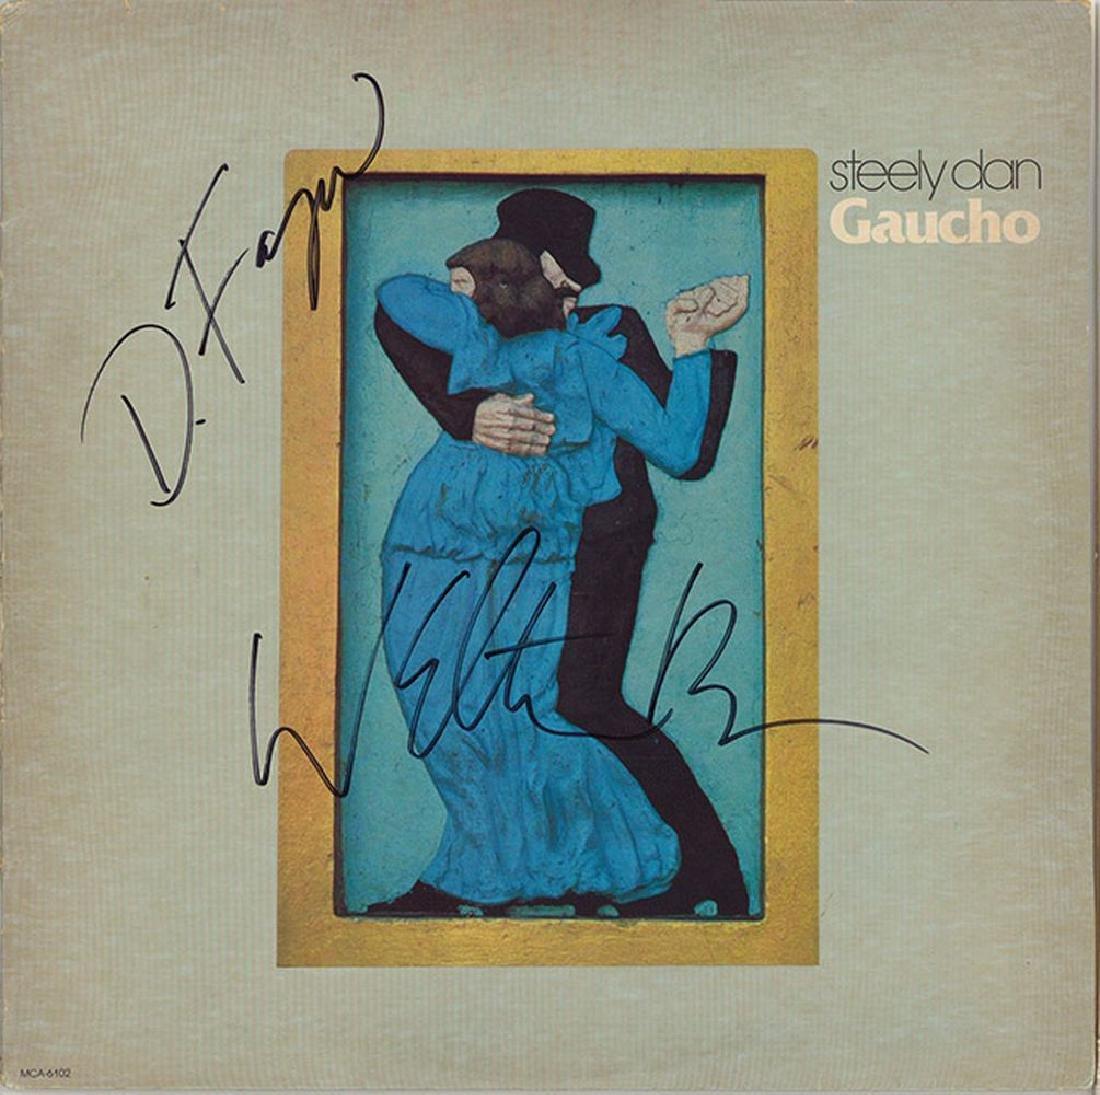 Steely Dan Signed Gaucho Album